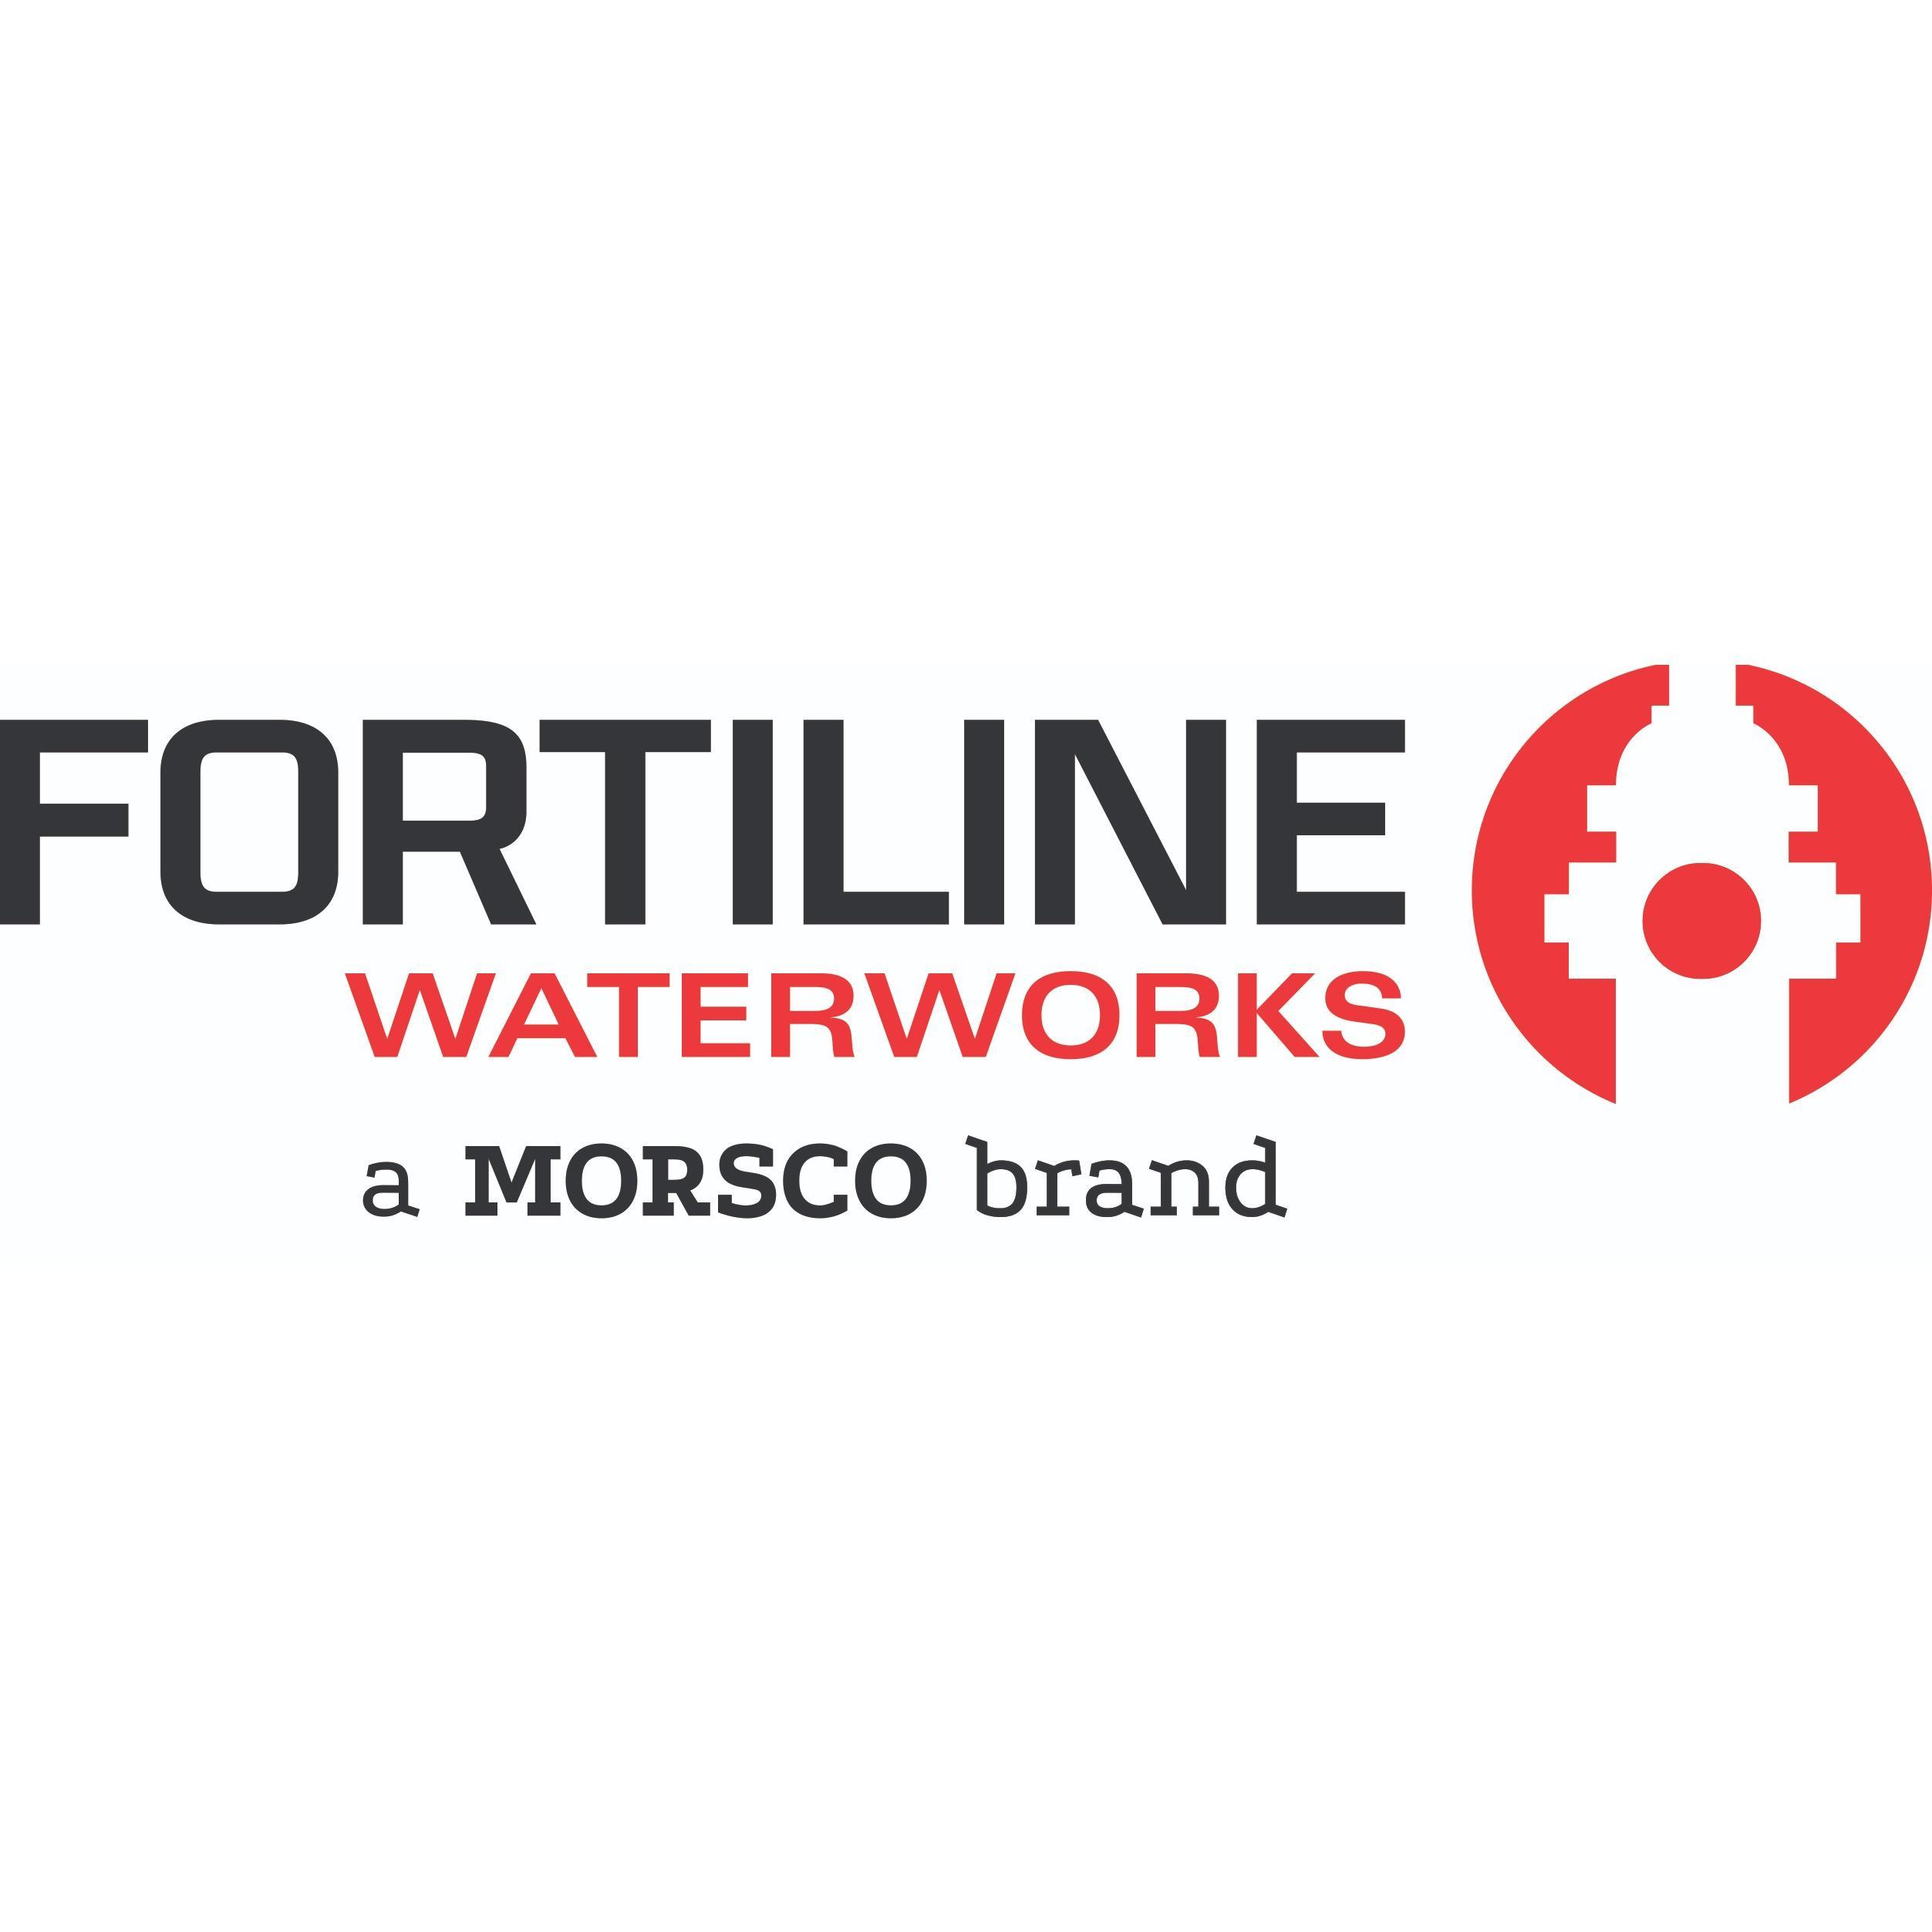 Fortiline Waterworks